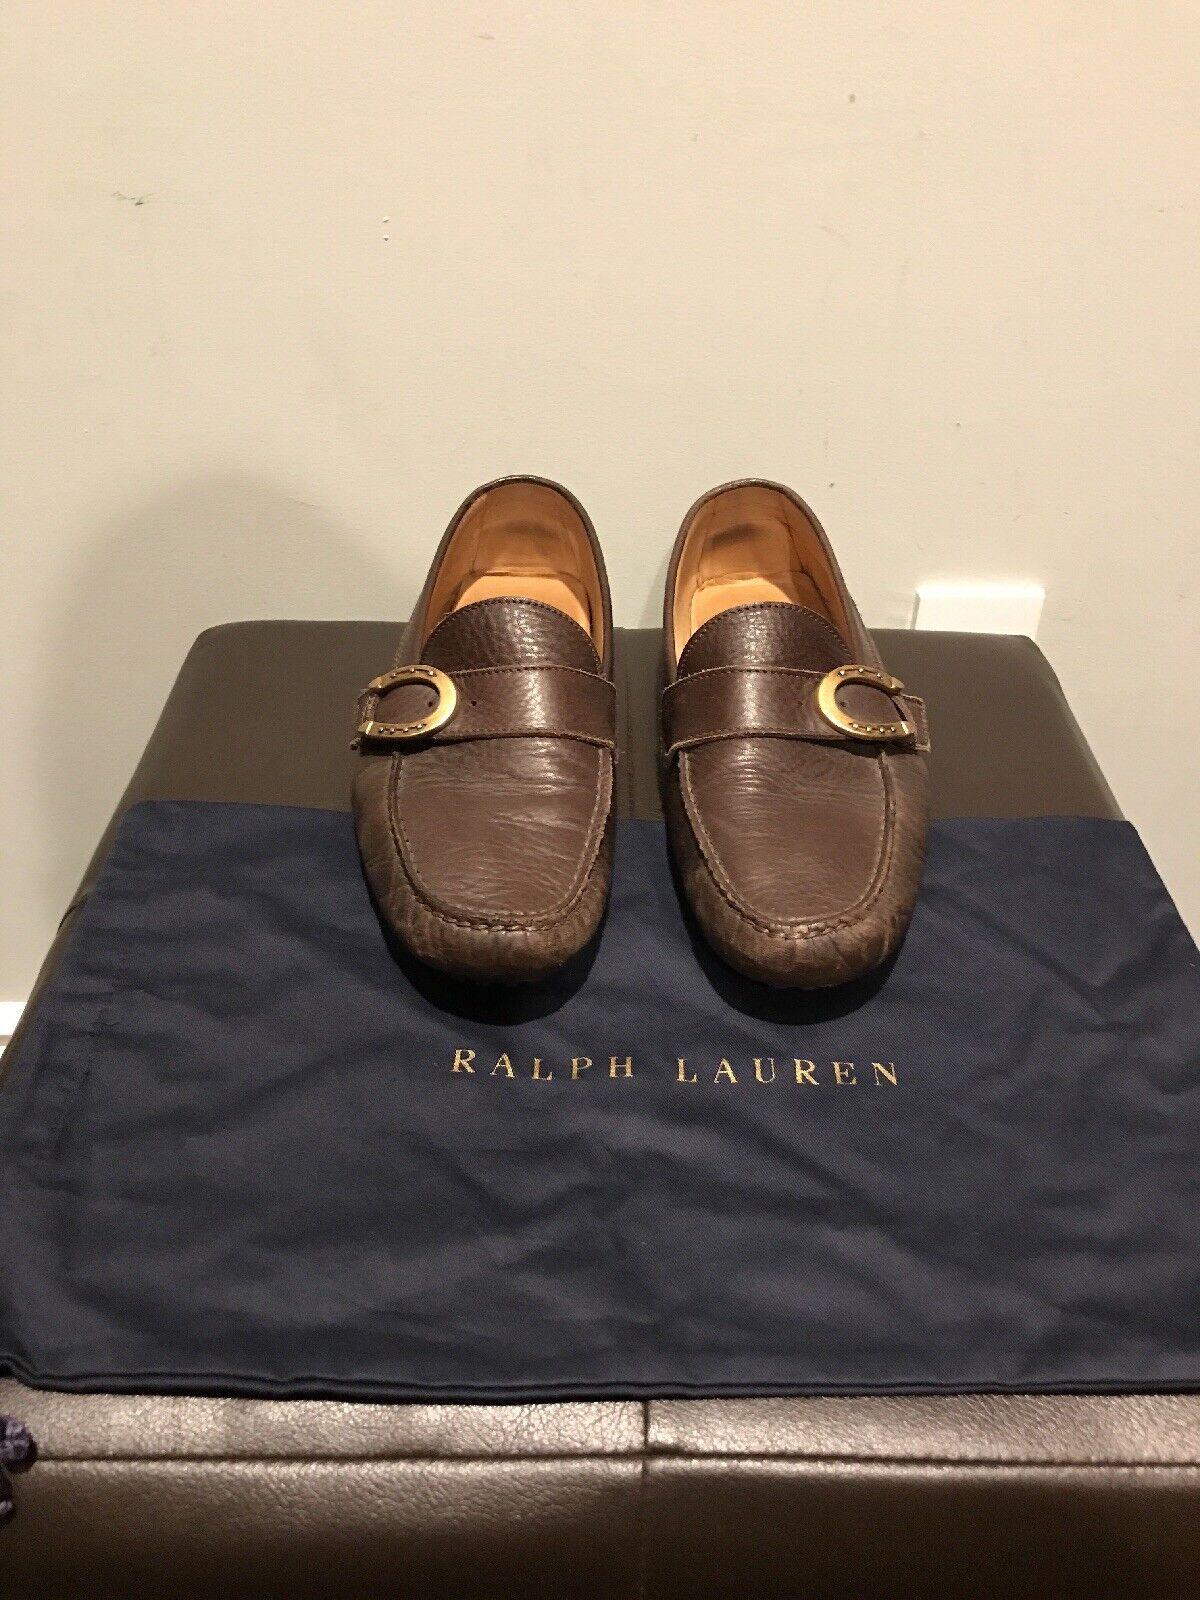 495 - Ralph Lauren Purple Label - Brown Loafer - Size 10